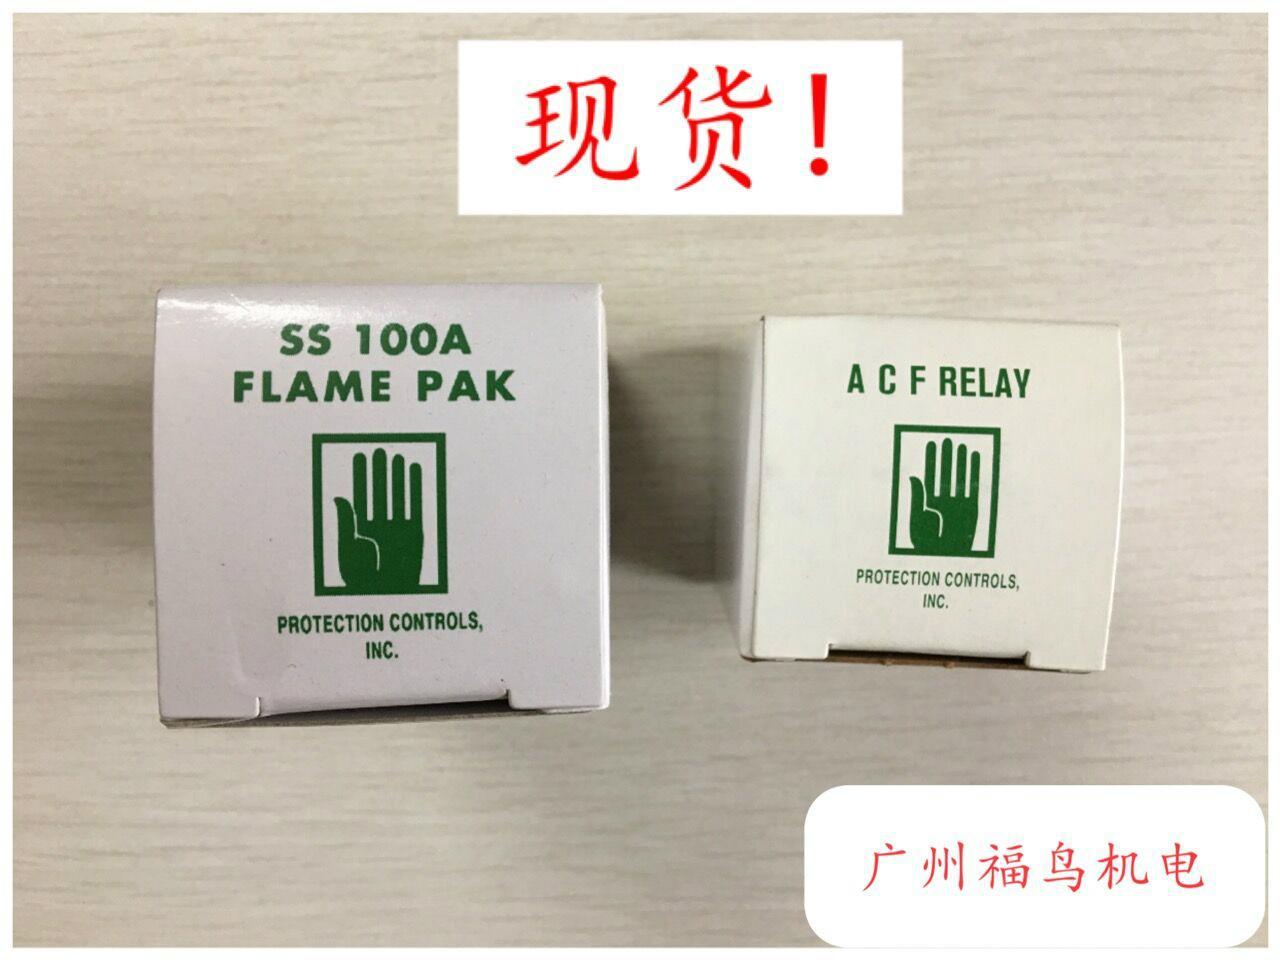 PROTECTION CONTROLS INC燃燒控制器  10